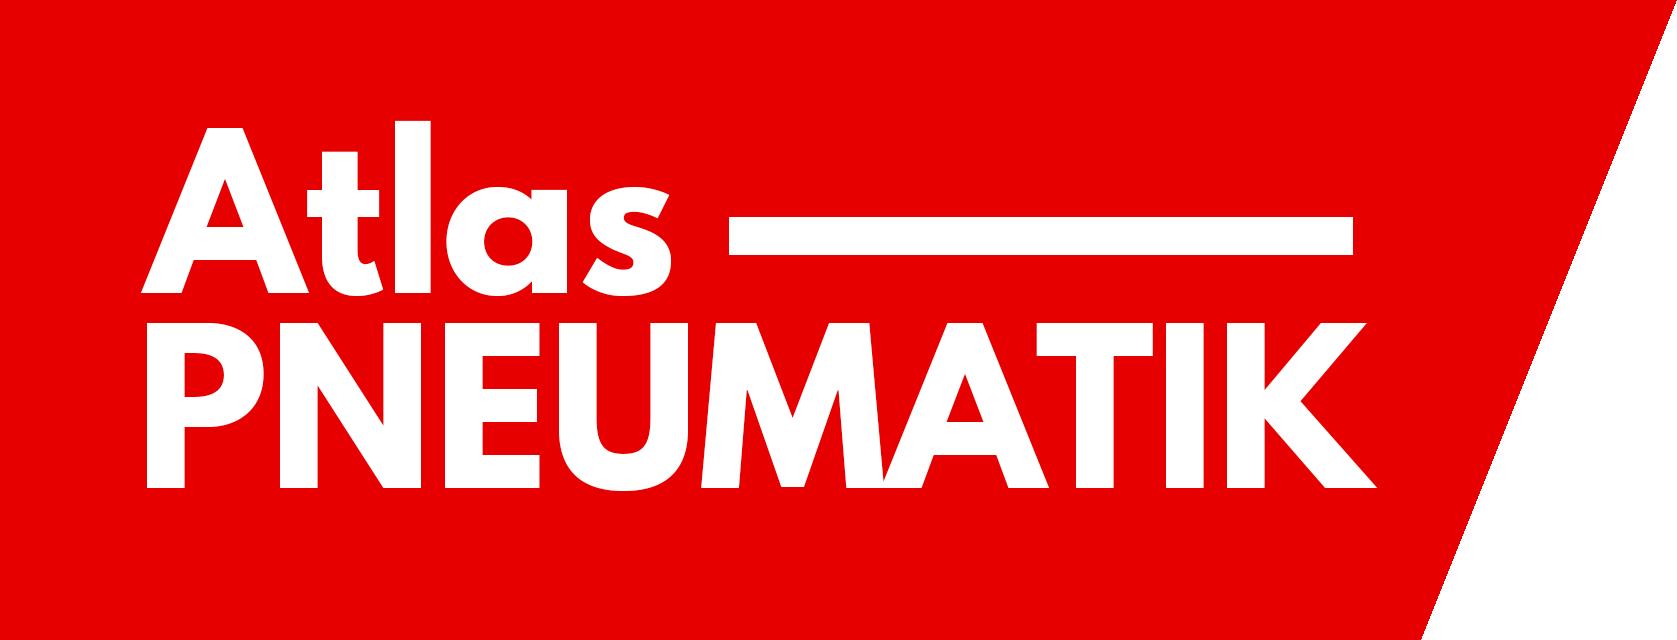 Atlas PNEUMATIK